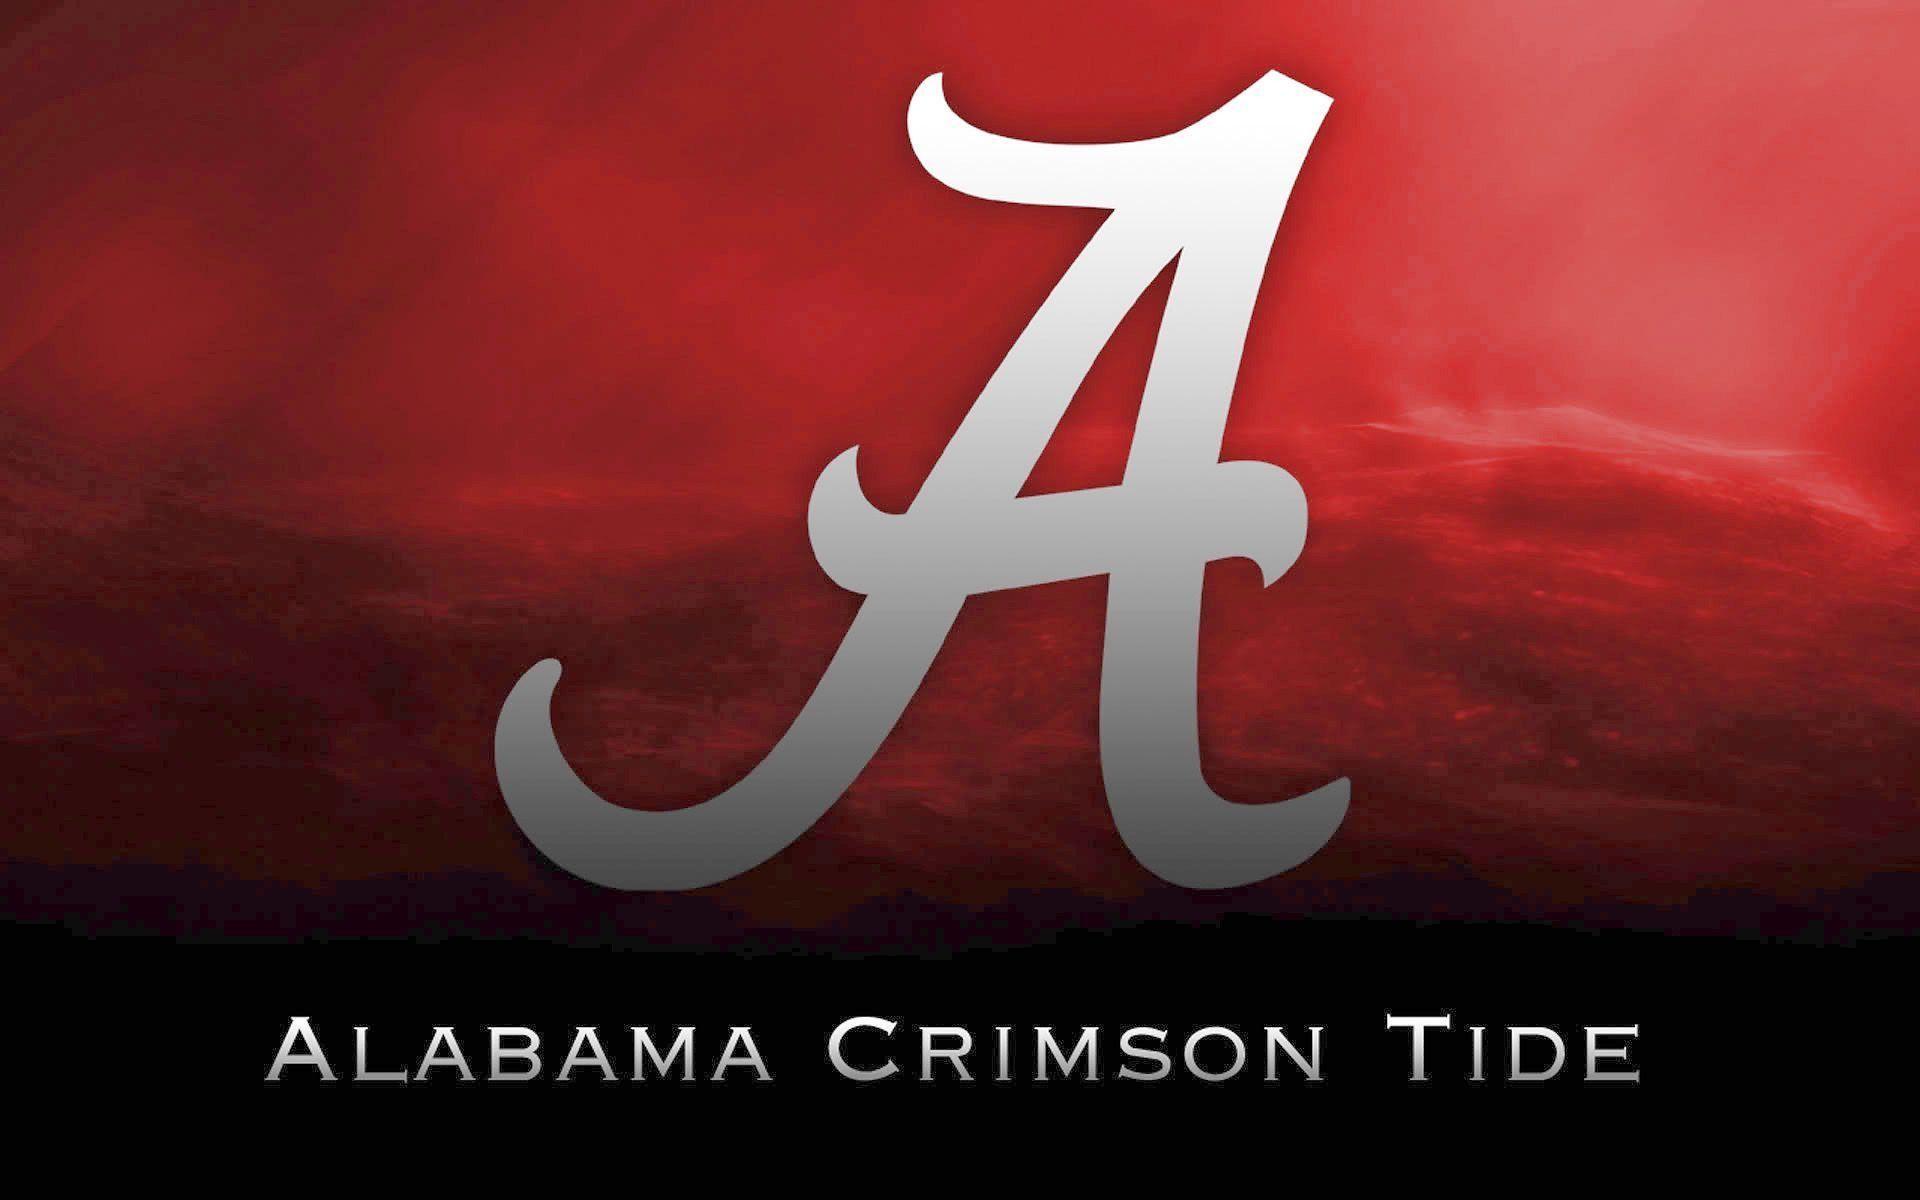 Alabama Wallpapers – Full HD wallpaper search